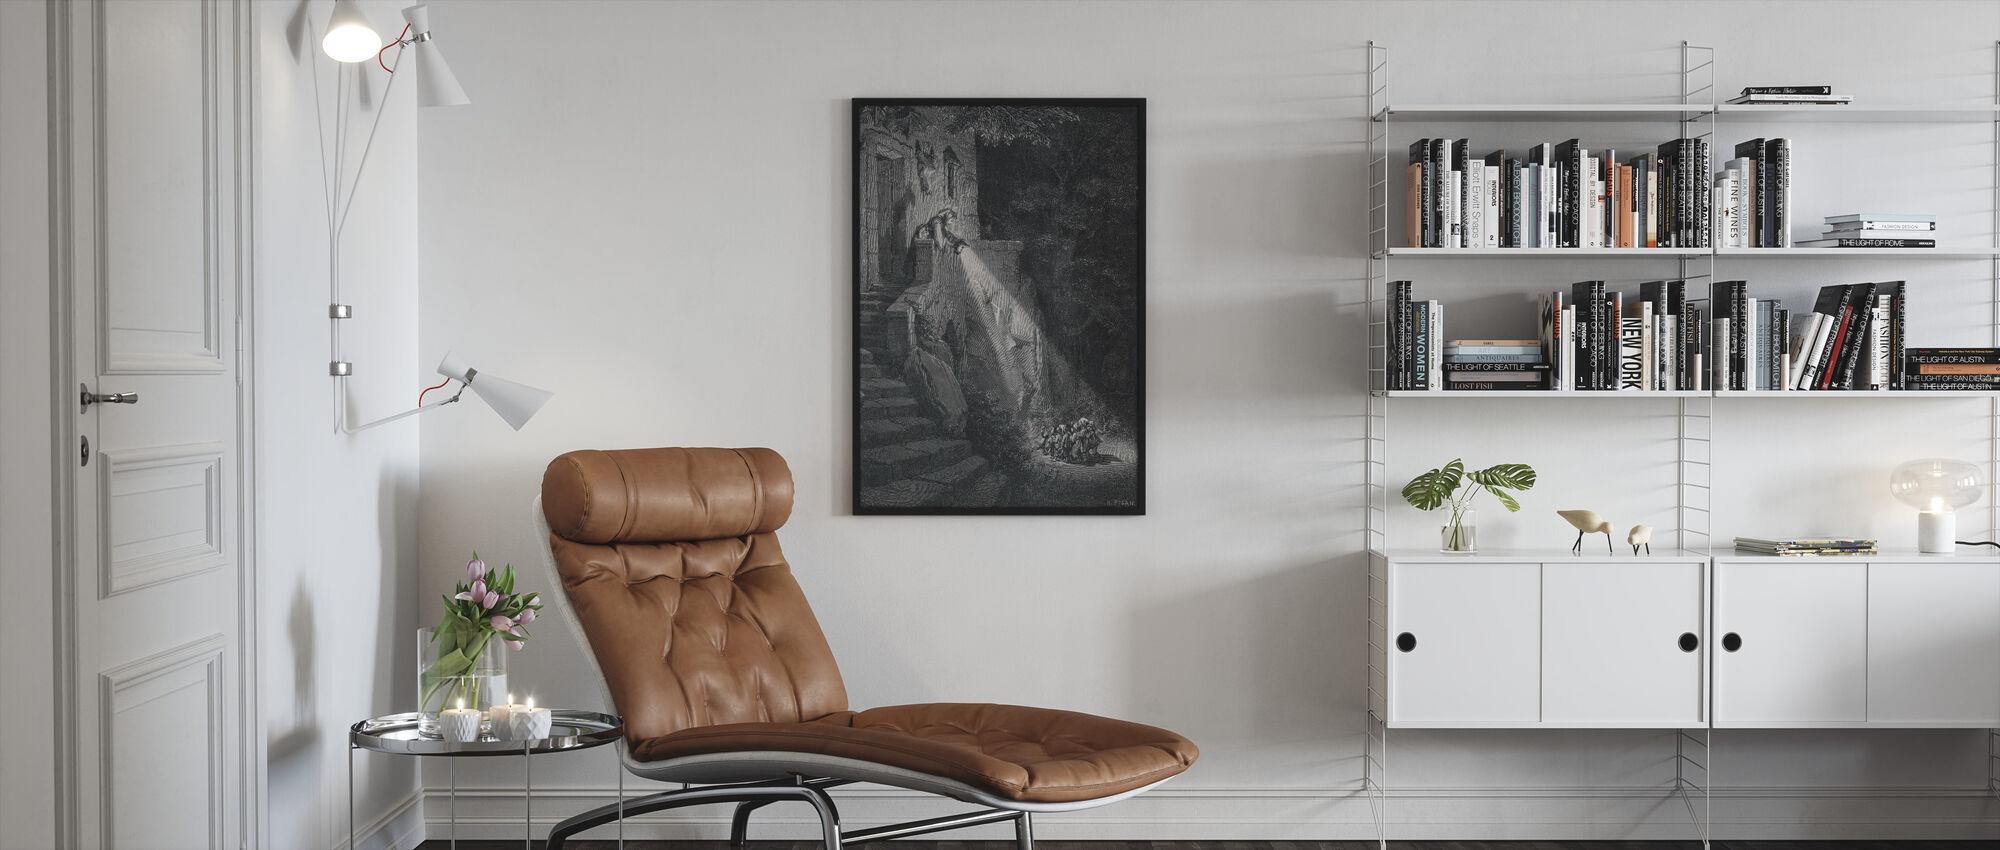 Gustave Dore - Ogre in the Forest - Framed print - Living Room